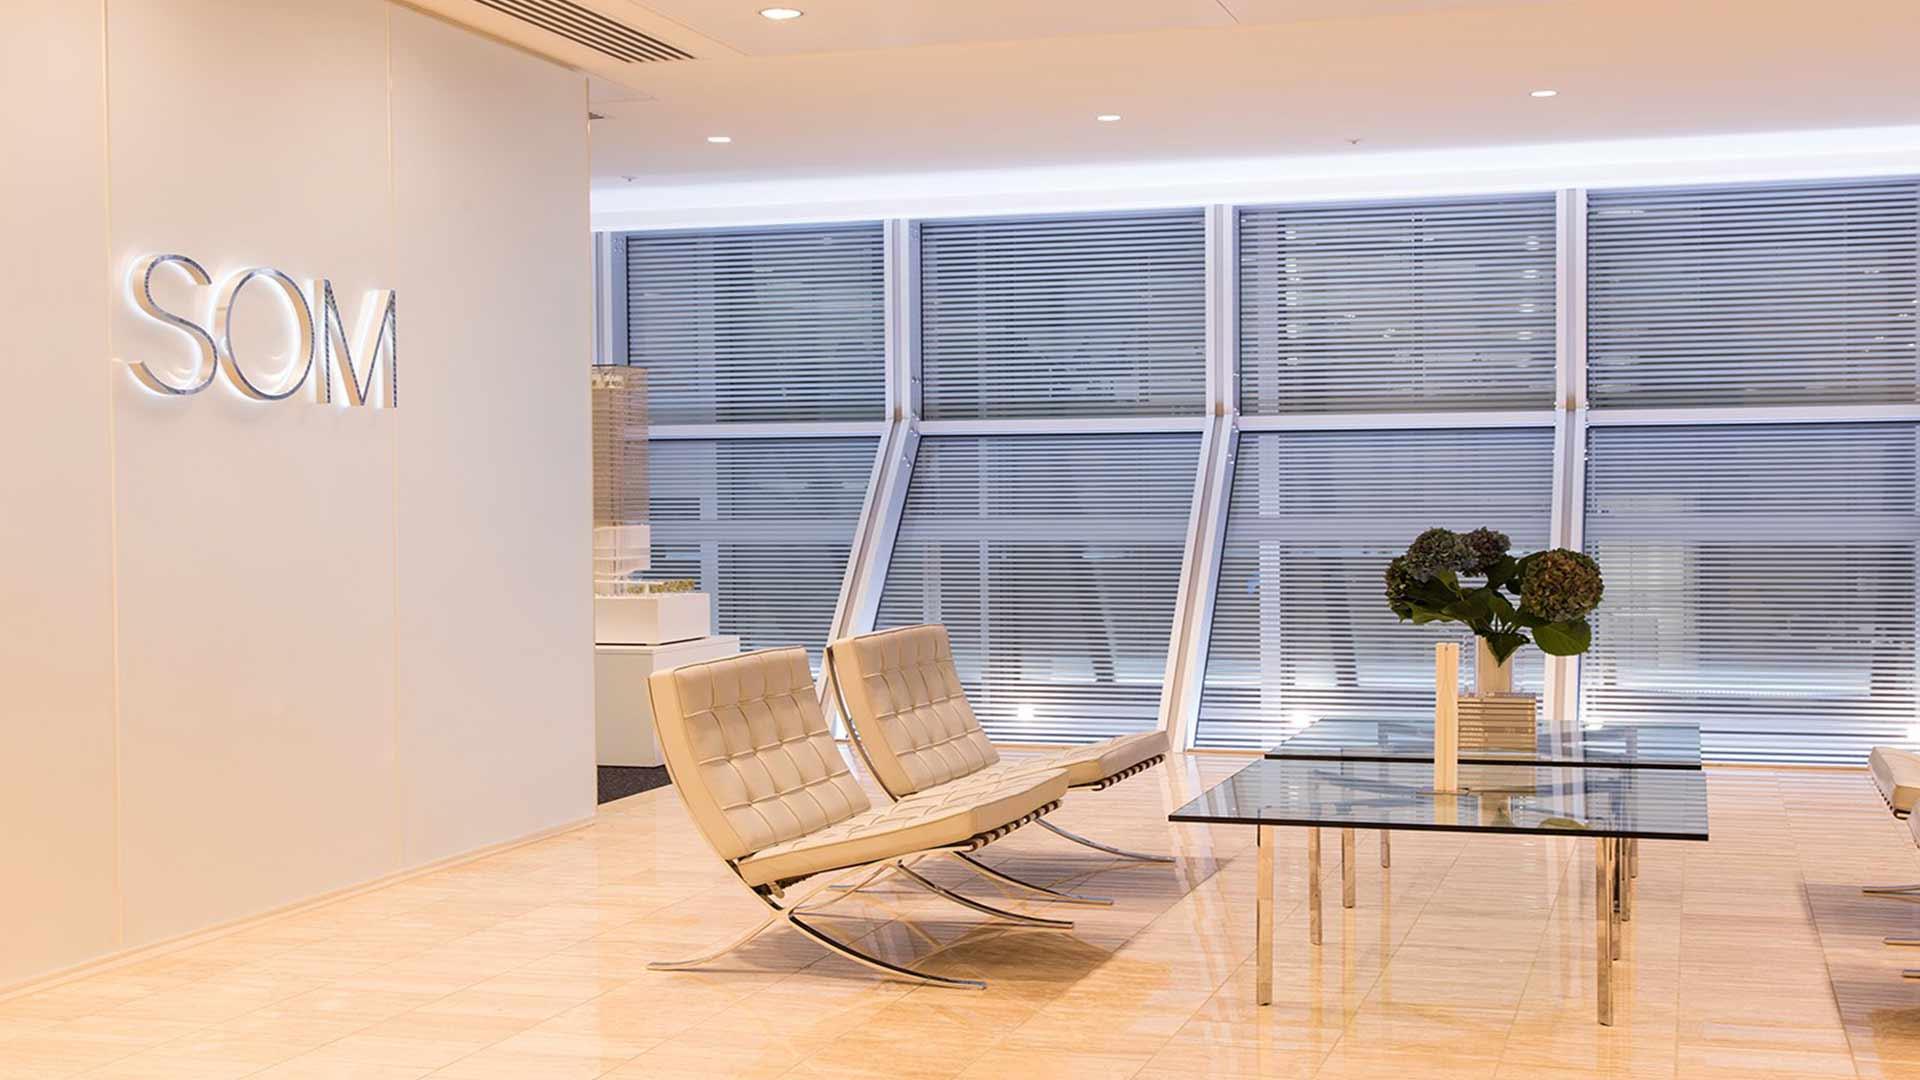 Lighting Design Solution Windows Daylight Modern Stylish Reception HQ Nulty